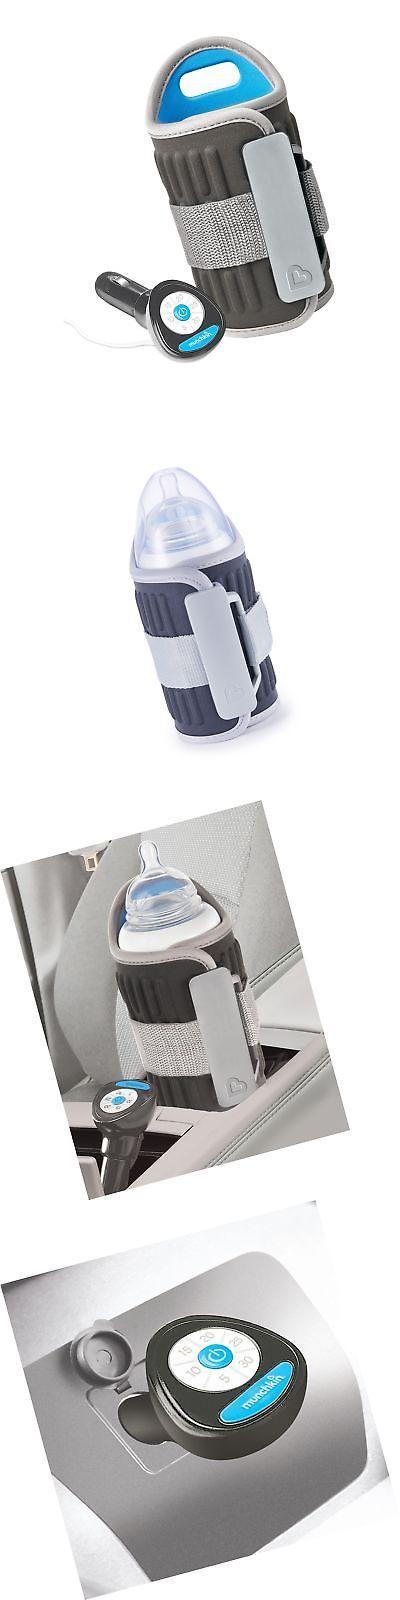 Munchkin Travel Baby Bottle Warmer. 12V Car Auto Heater Portable ...